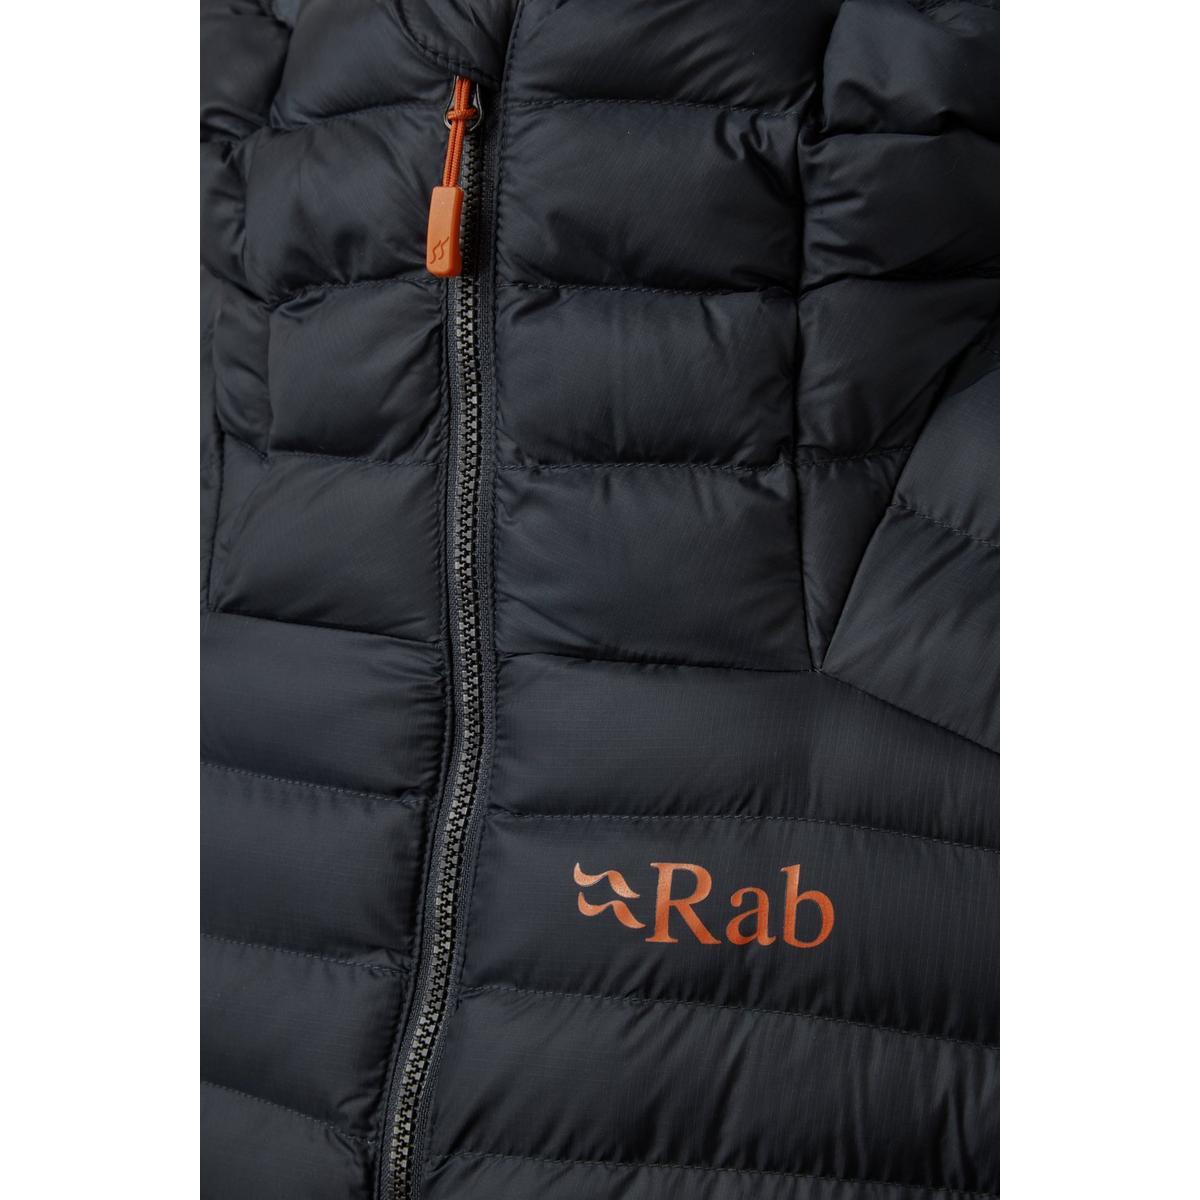 Rab Men's Rab Cirrus Alpine Jacket - Grey